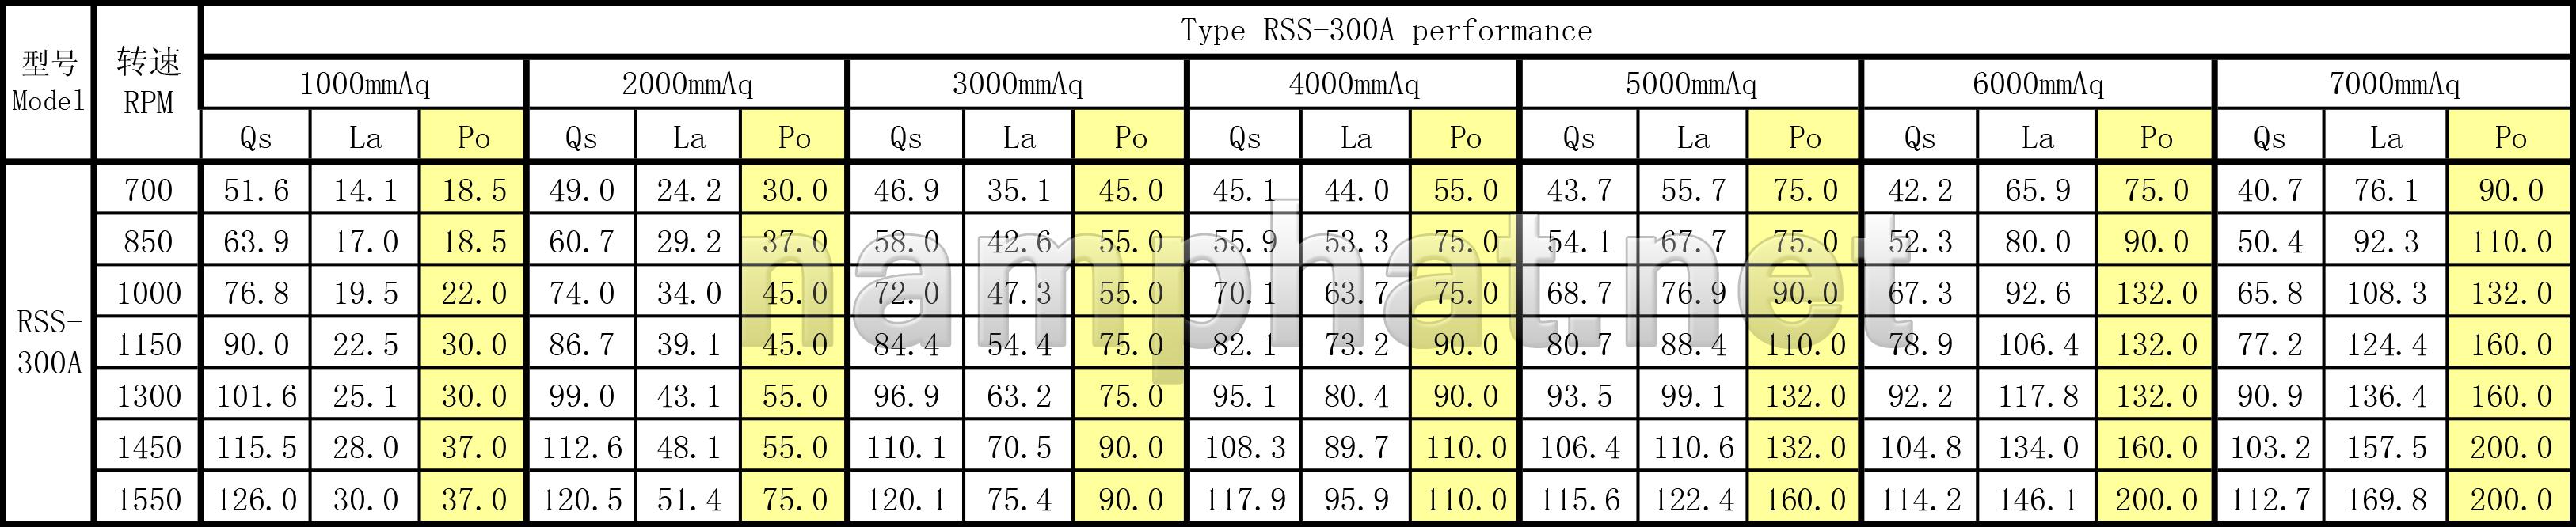 Catalogue máy thổi khí RSS-300A